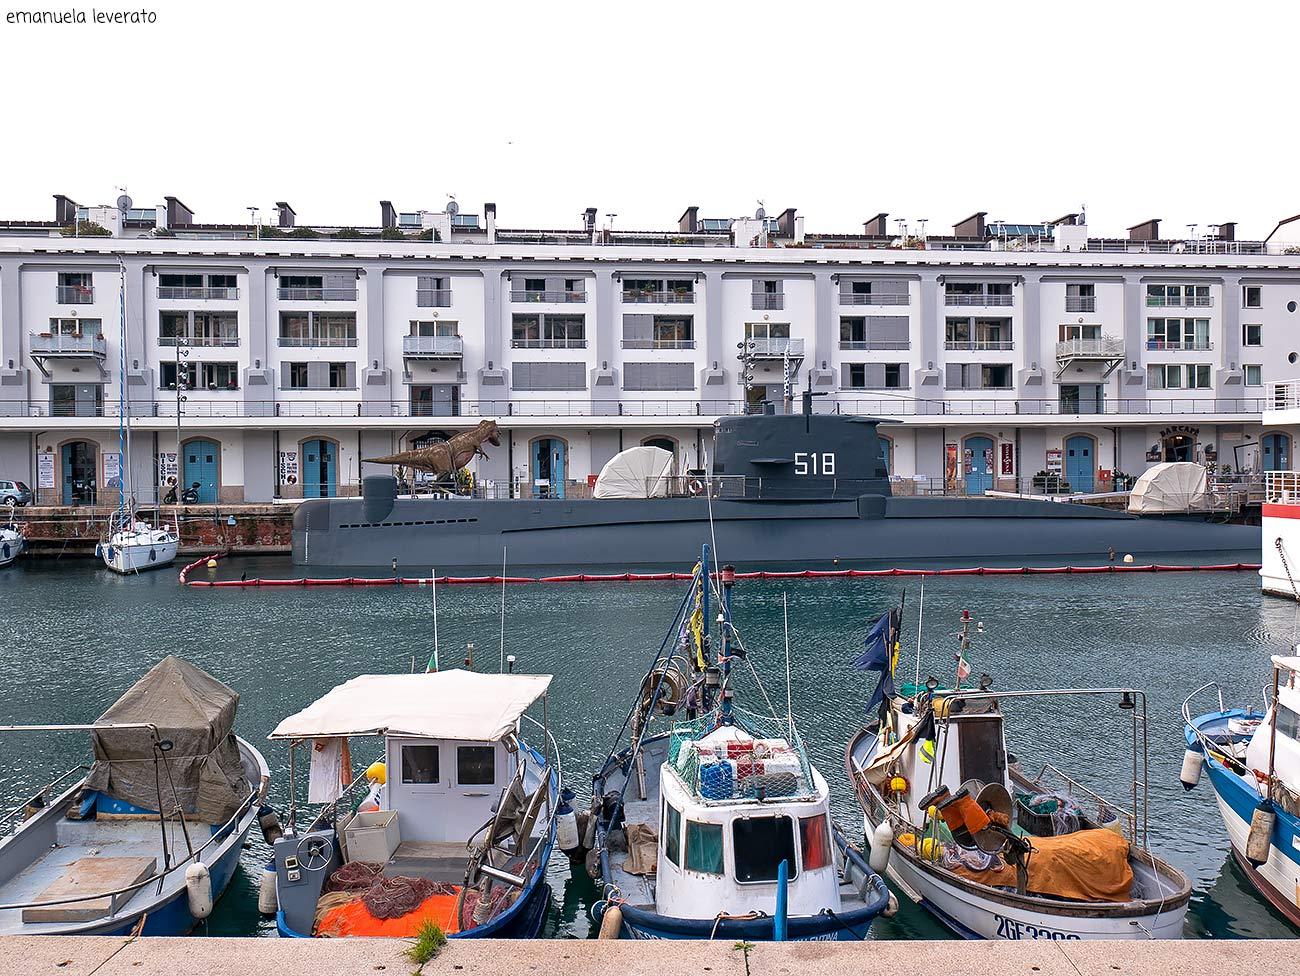 sottomarino-nazario-sauro-genova-porto antico di Genova (1)